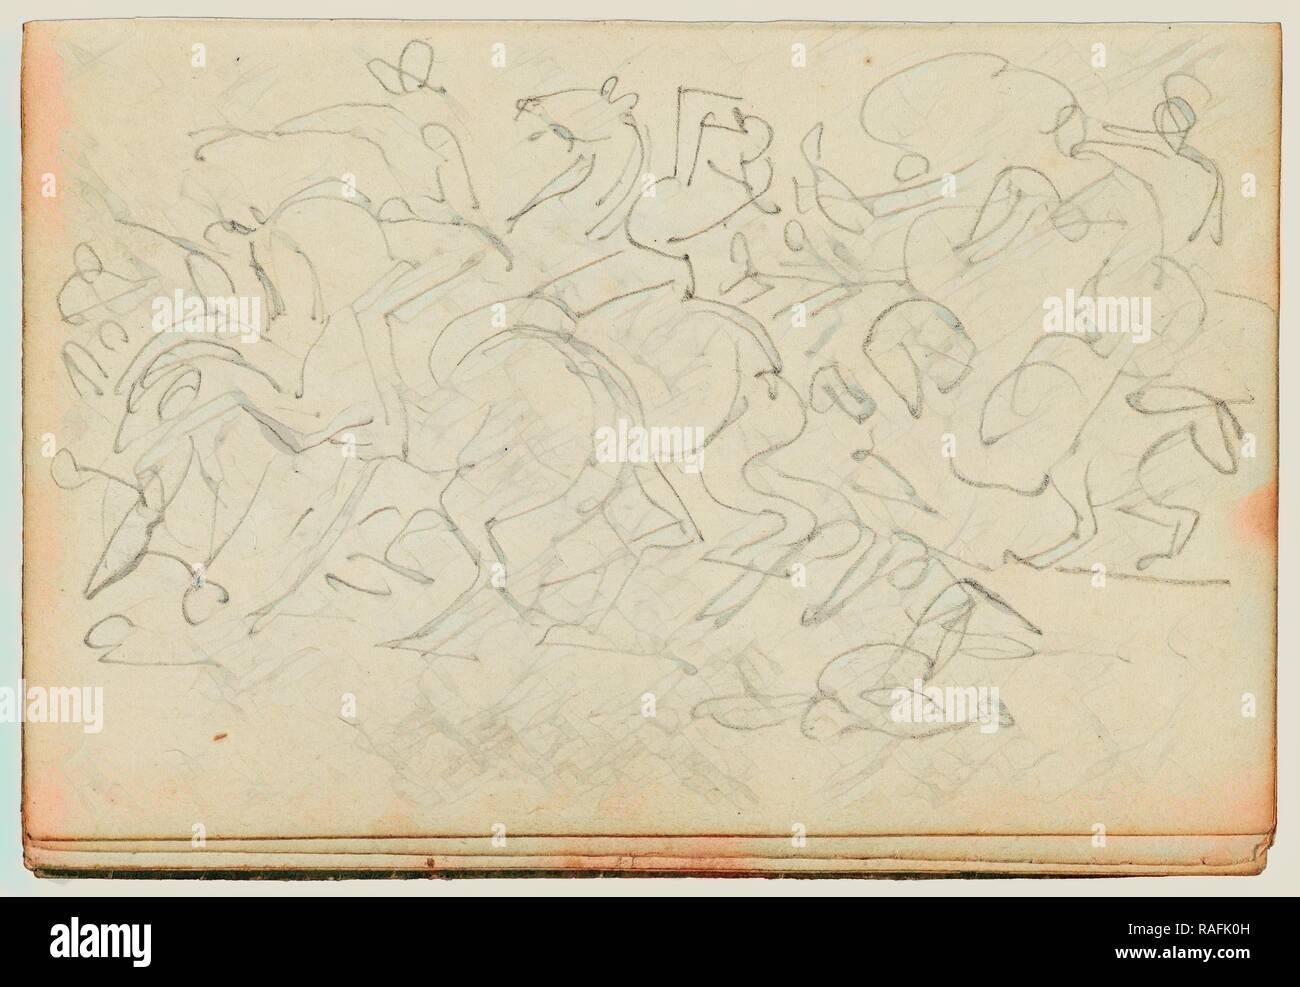 Cavalry Skirmish, Théodore Géricault (French, 1791 - 1824), 1812 - 1814, Graphite, 15.2 x 10.6 cm (6 x 4 3,16 in reimagined - Stock Image